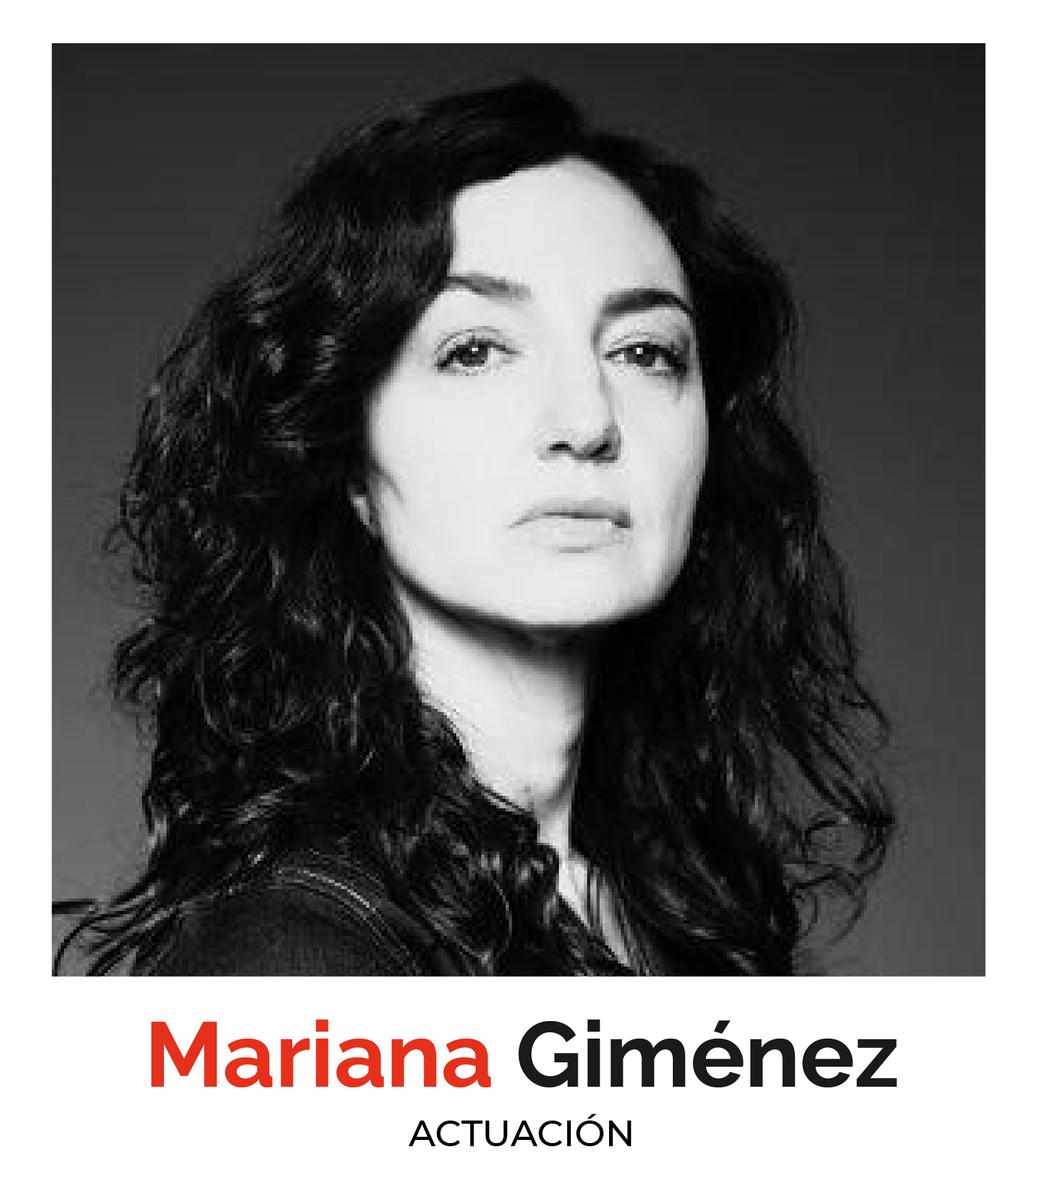 Mariana Gimenez